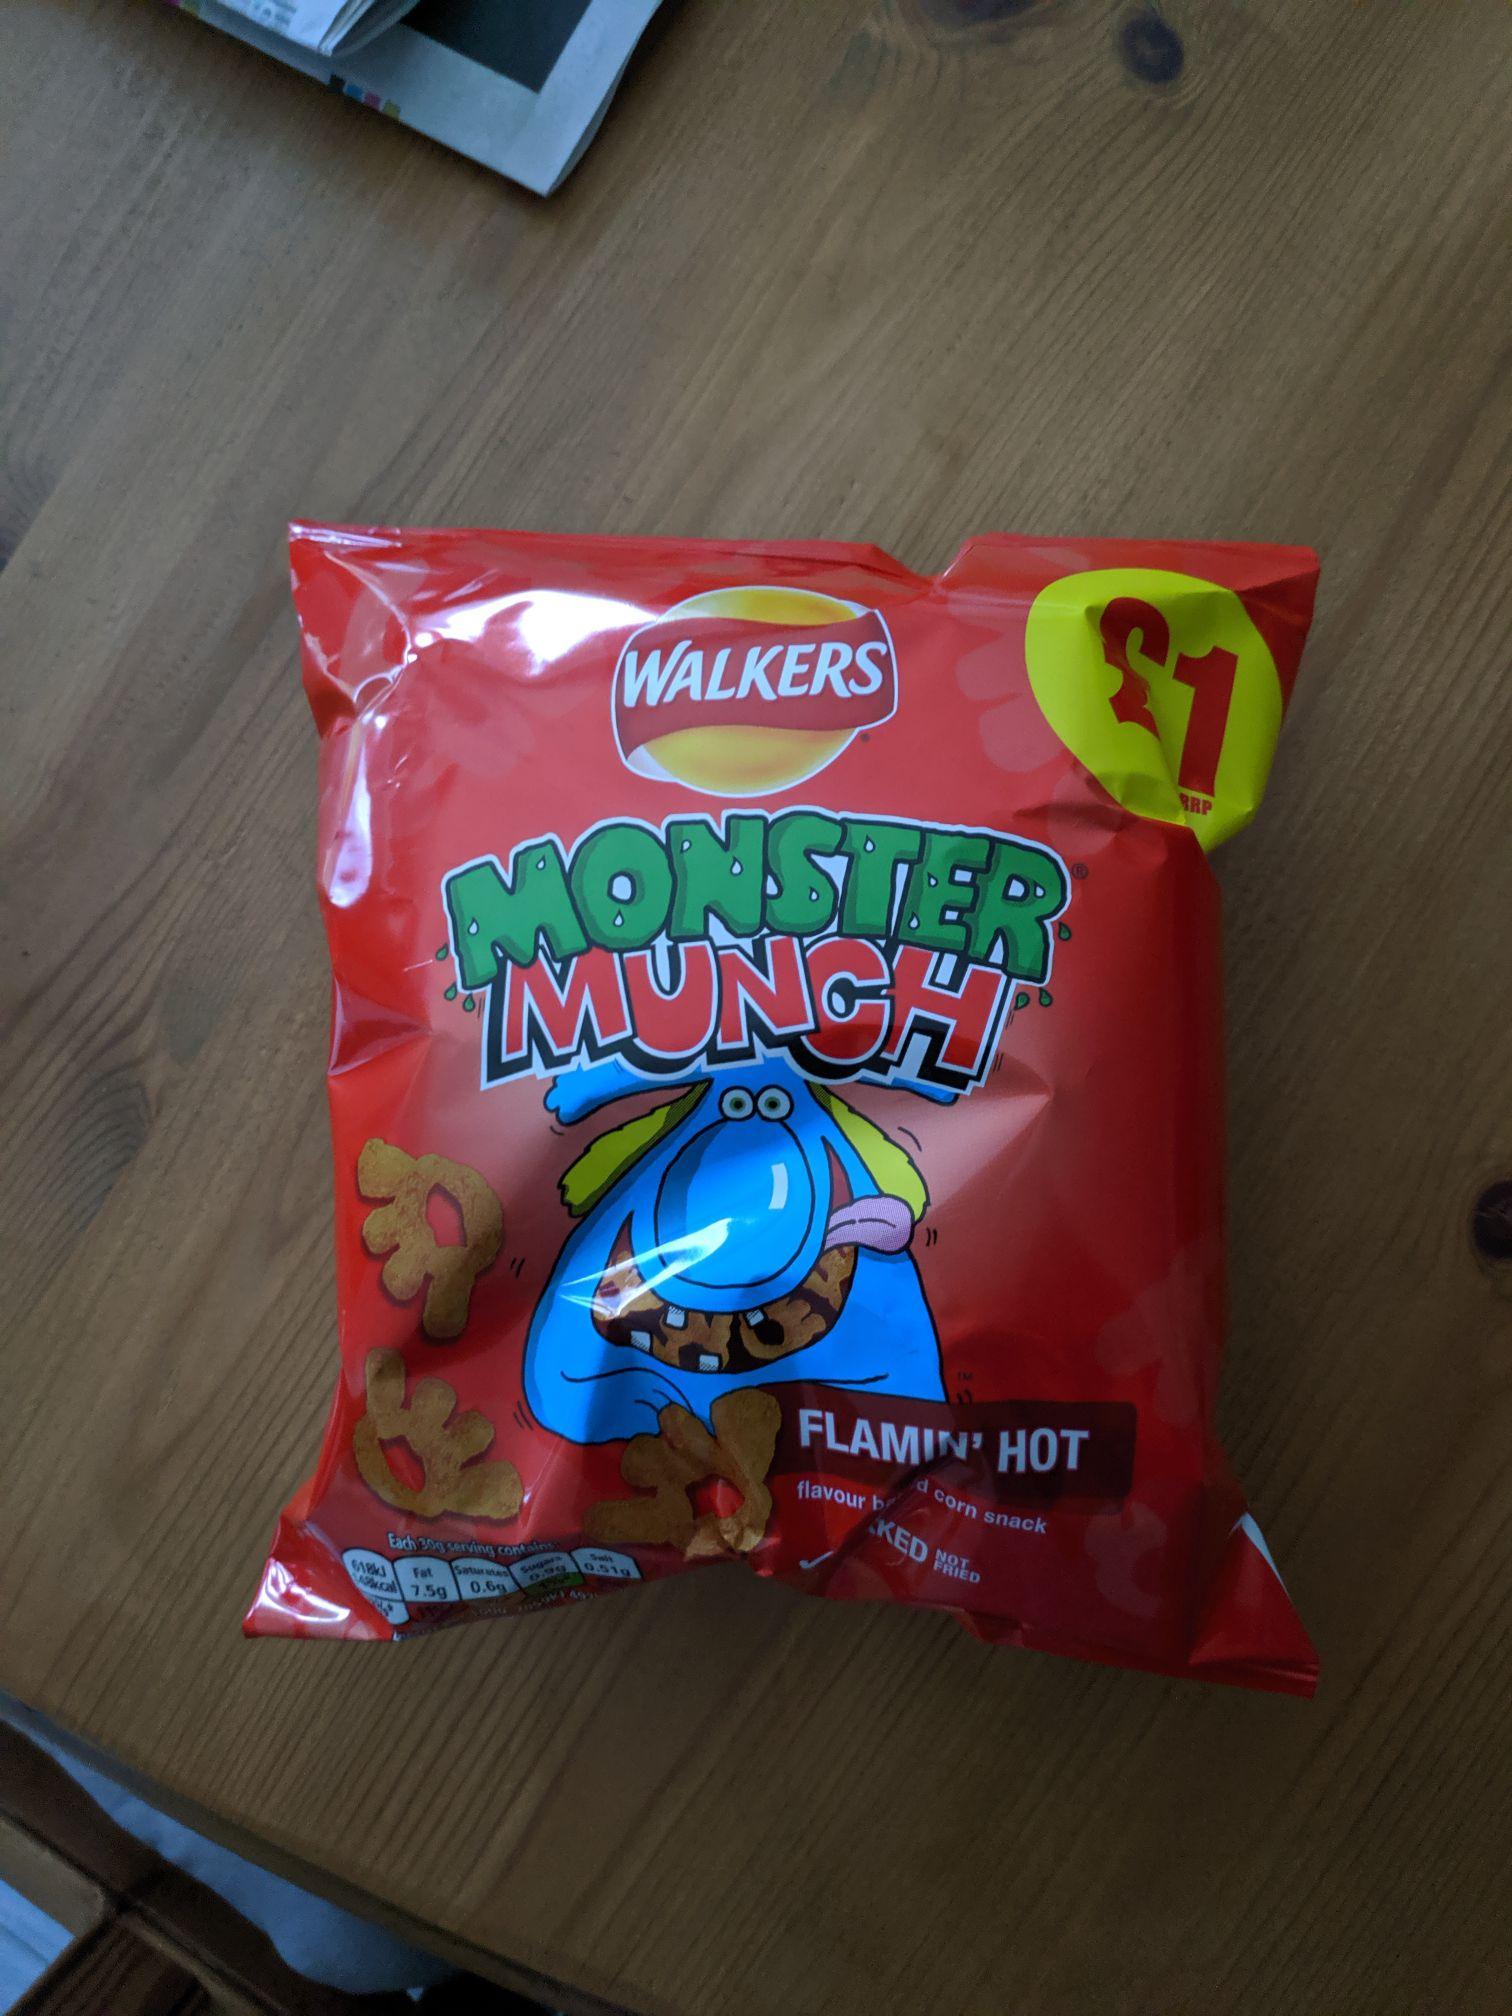 68g Flaming hot monster munch - 6 for £1 at Heron Foods (Halesowen)